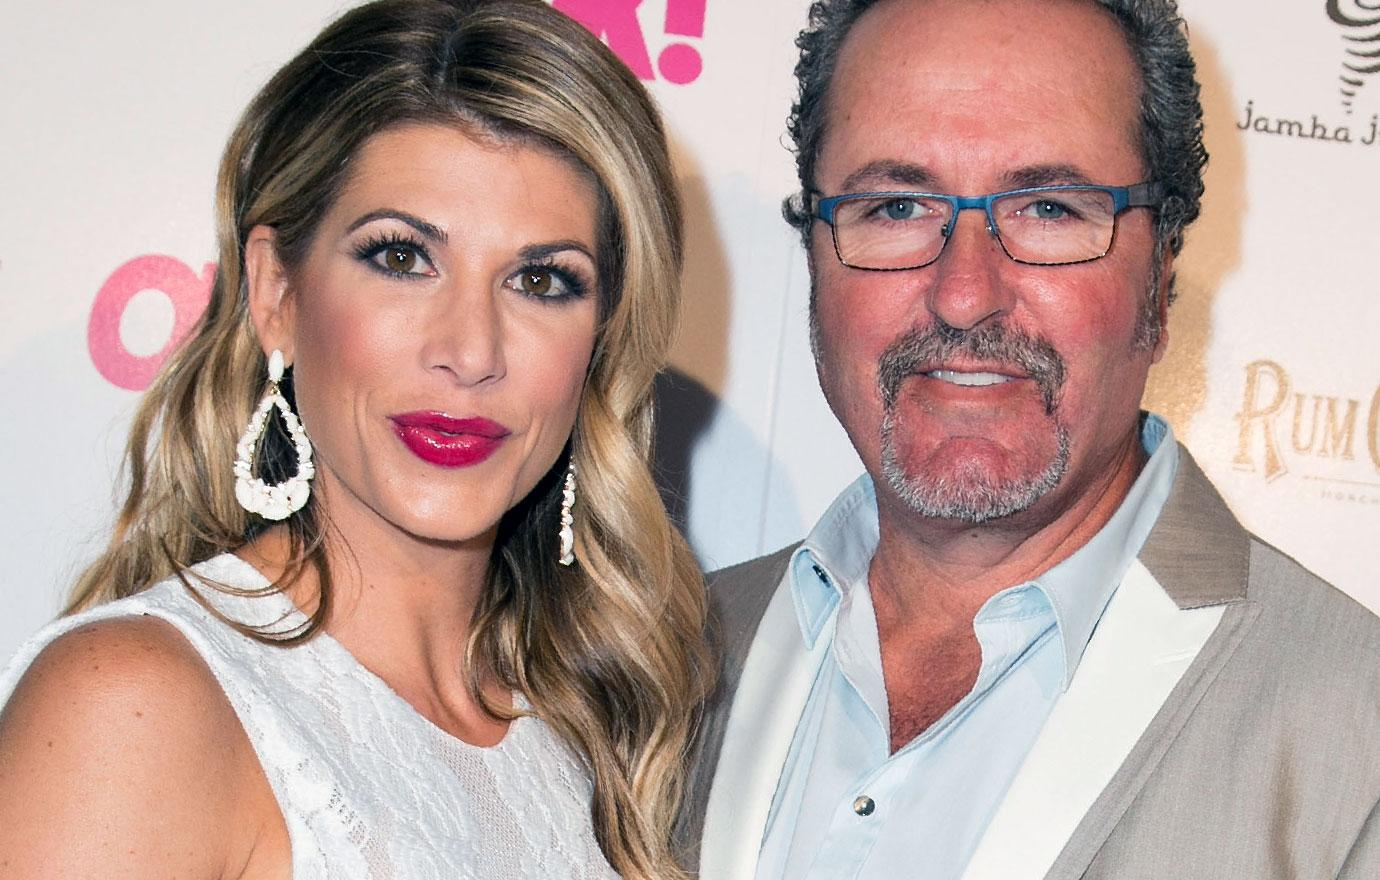 RHOC Alexis Bellino's Ex Husband's Legal Battle Over